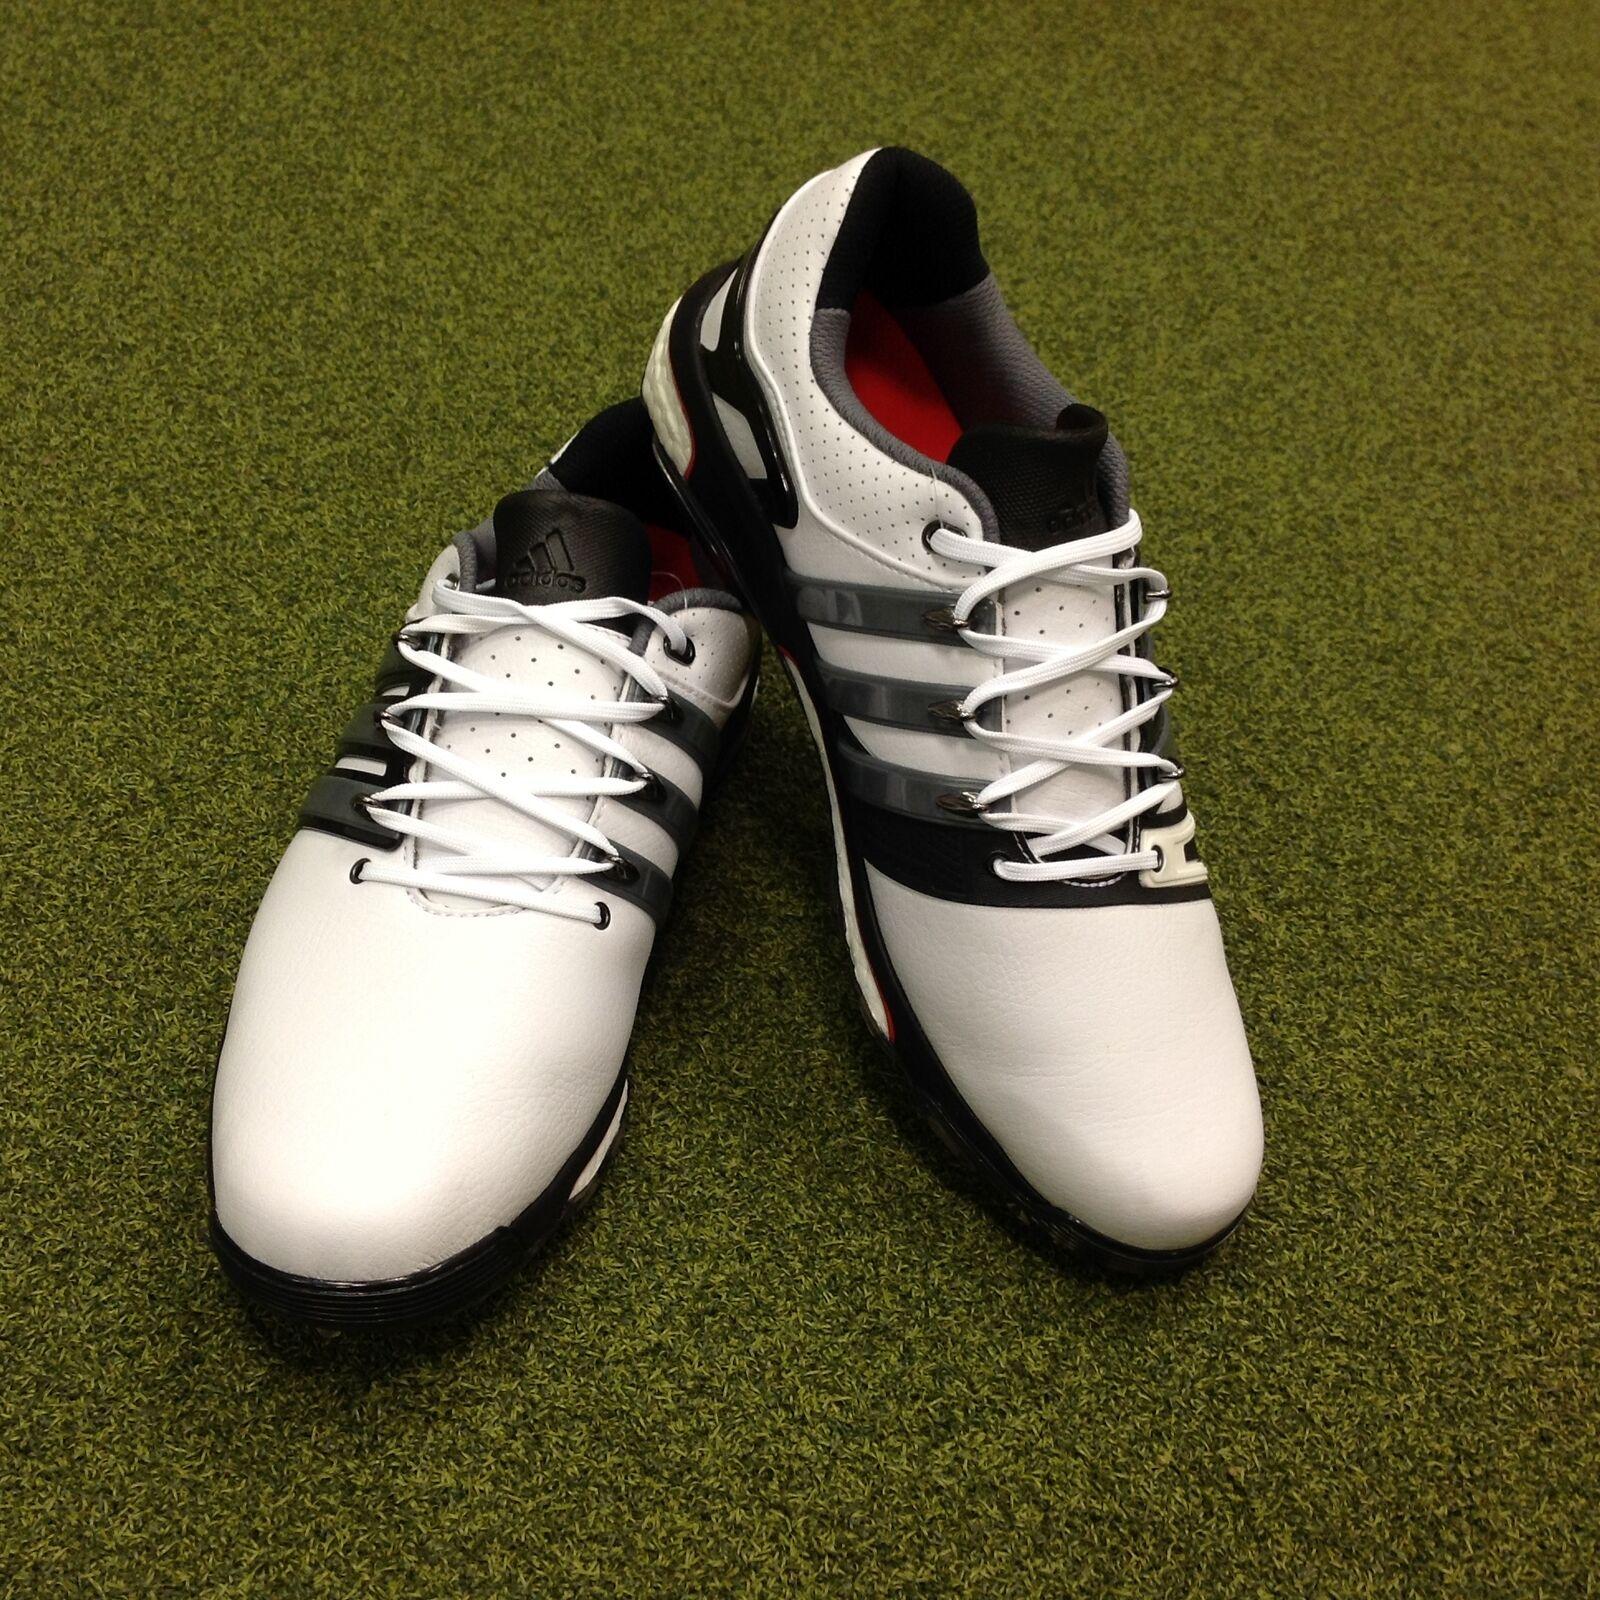 NUOVO Adidas Asym Energy Scarpe Da 42 Golf Boost-misure US 9-EU 42 Da 2/3 d49d6c